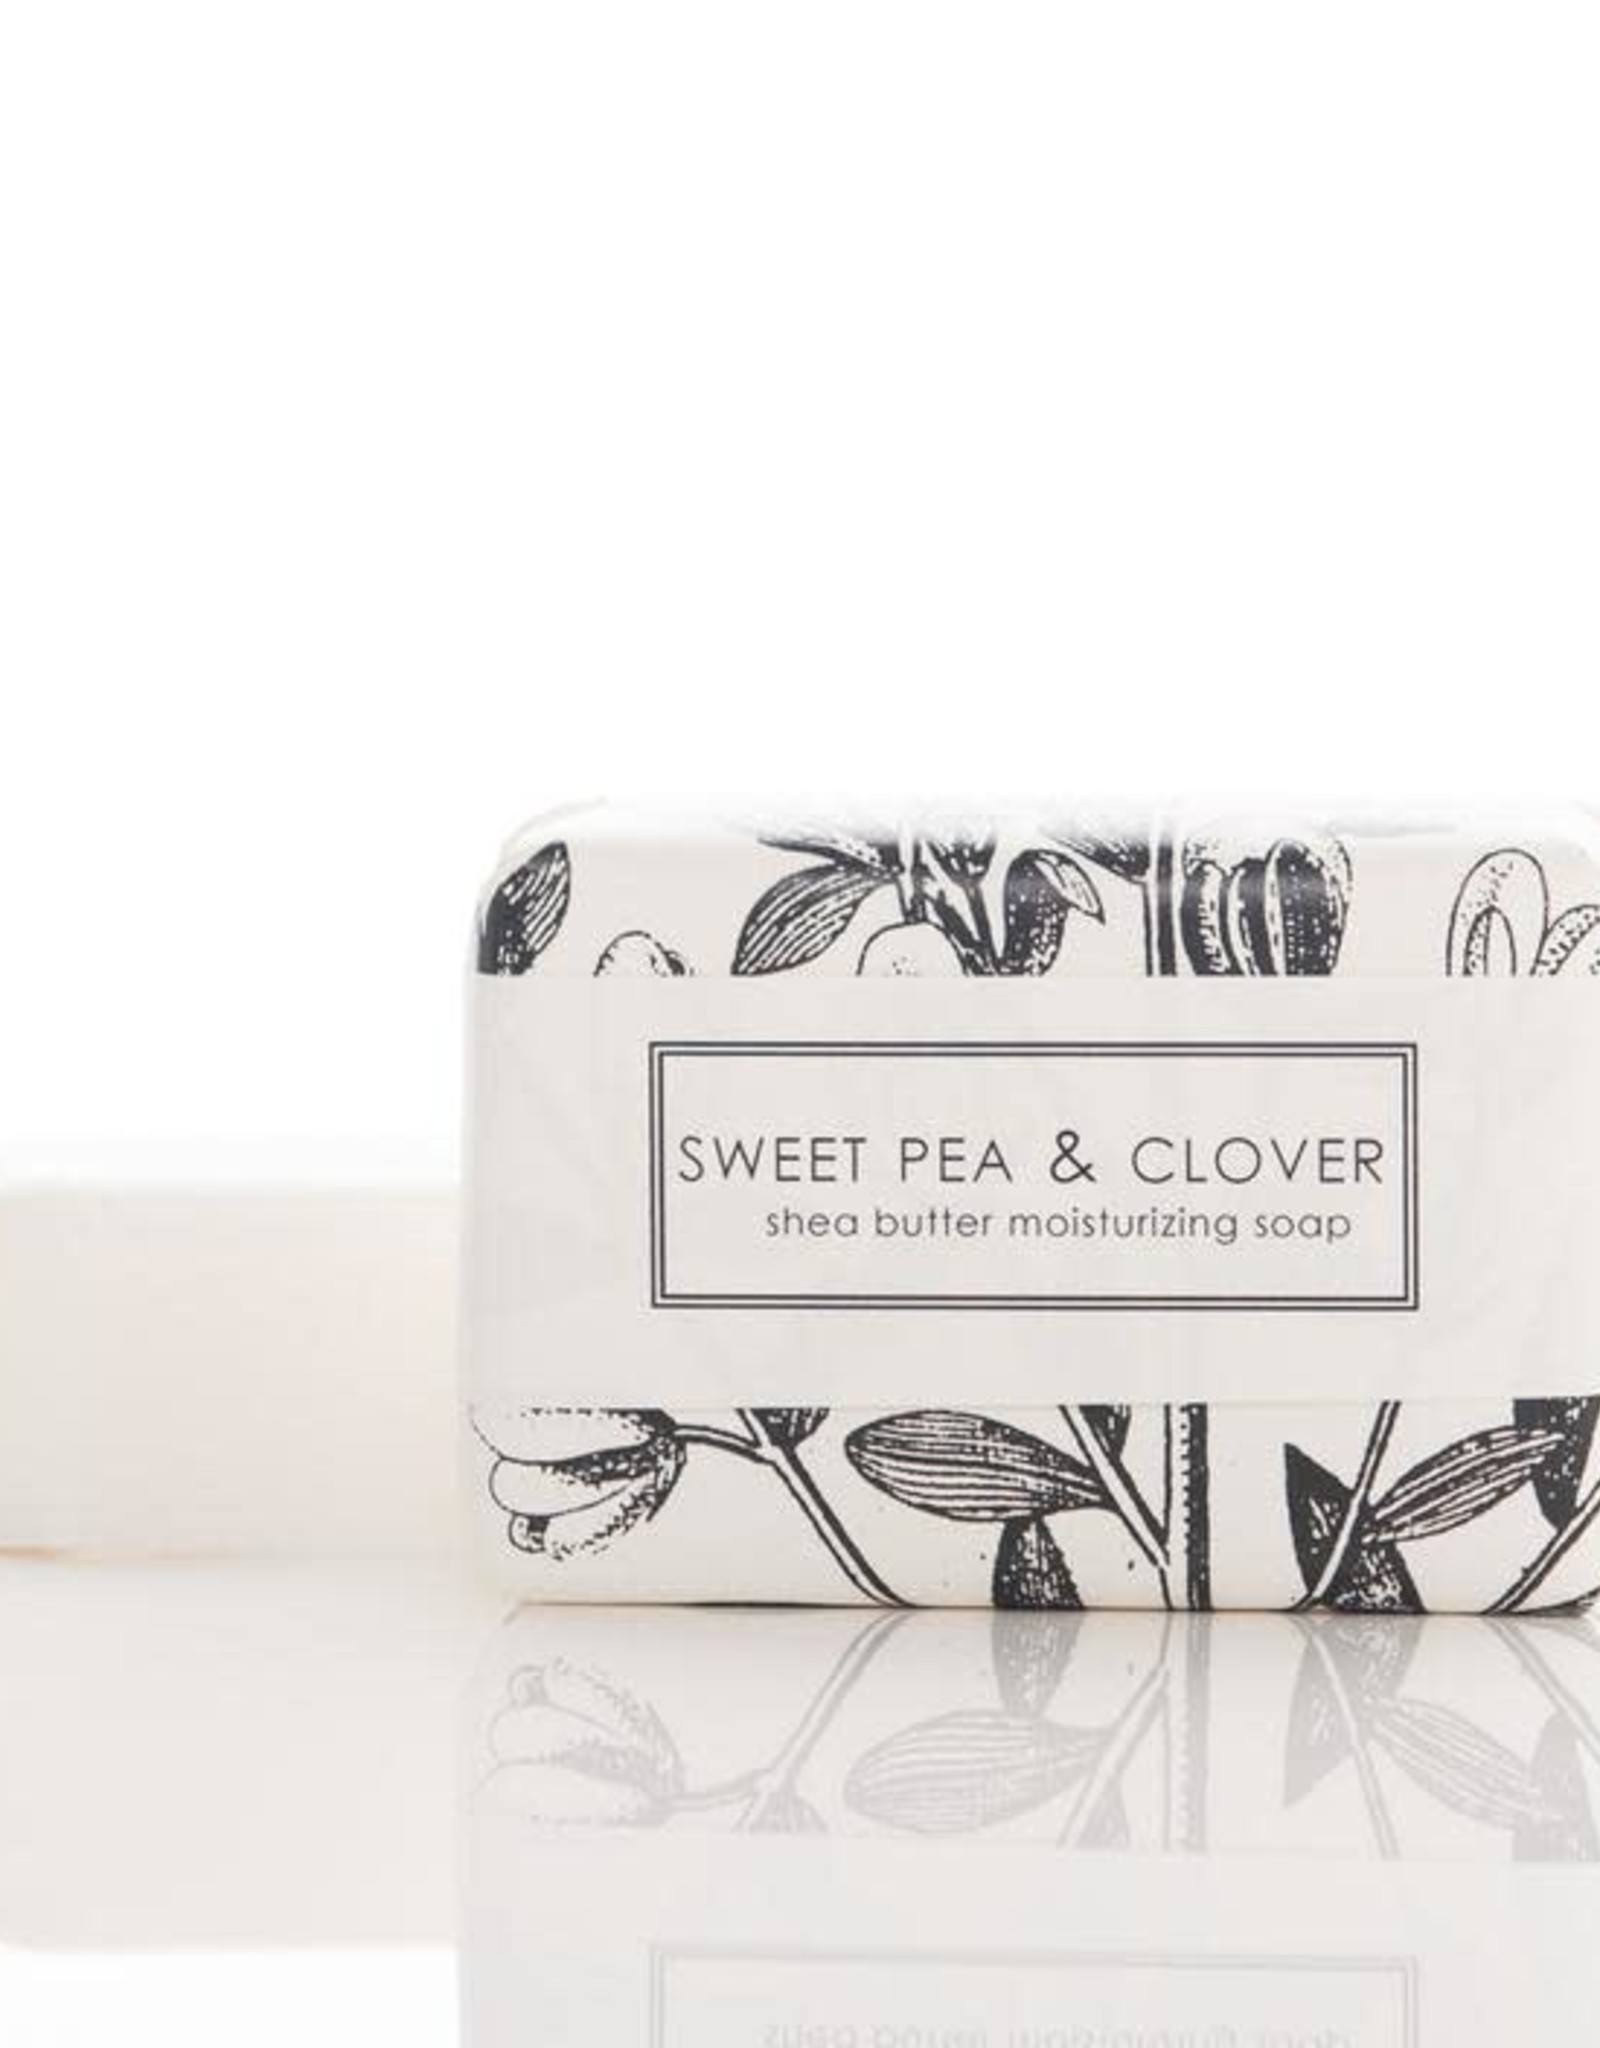 Formulary 55 Sweet Pea & Clover Soap